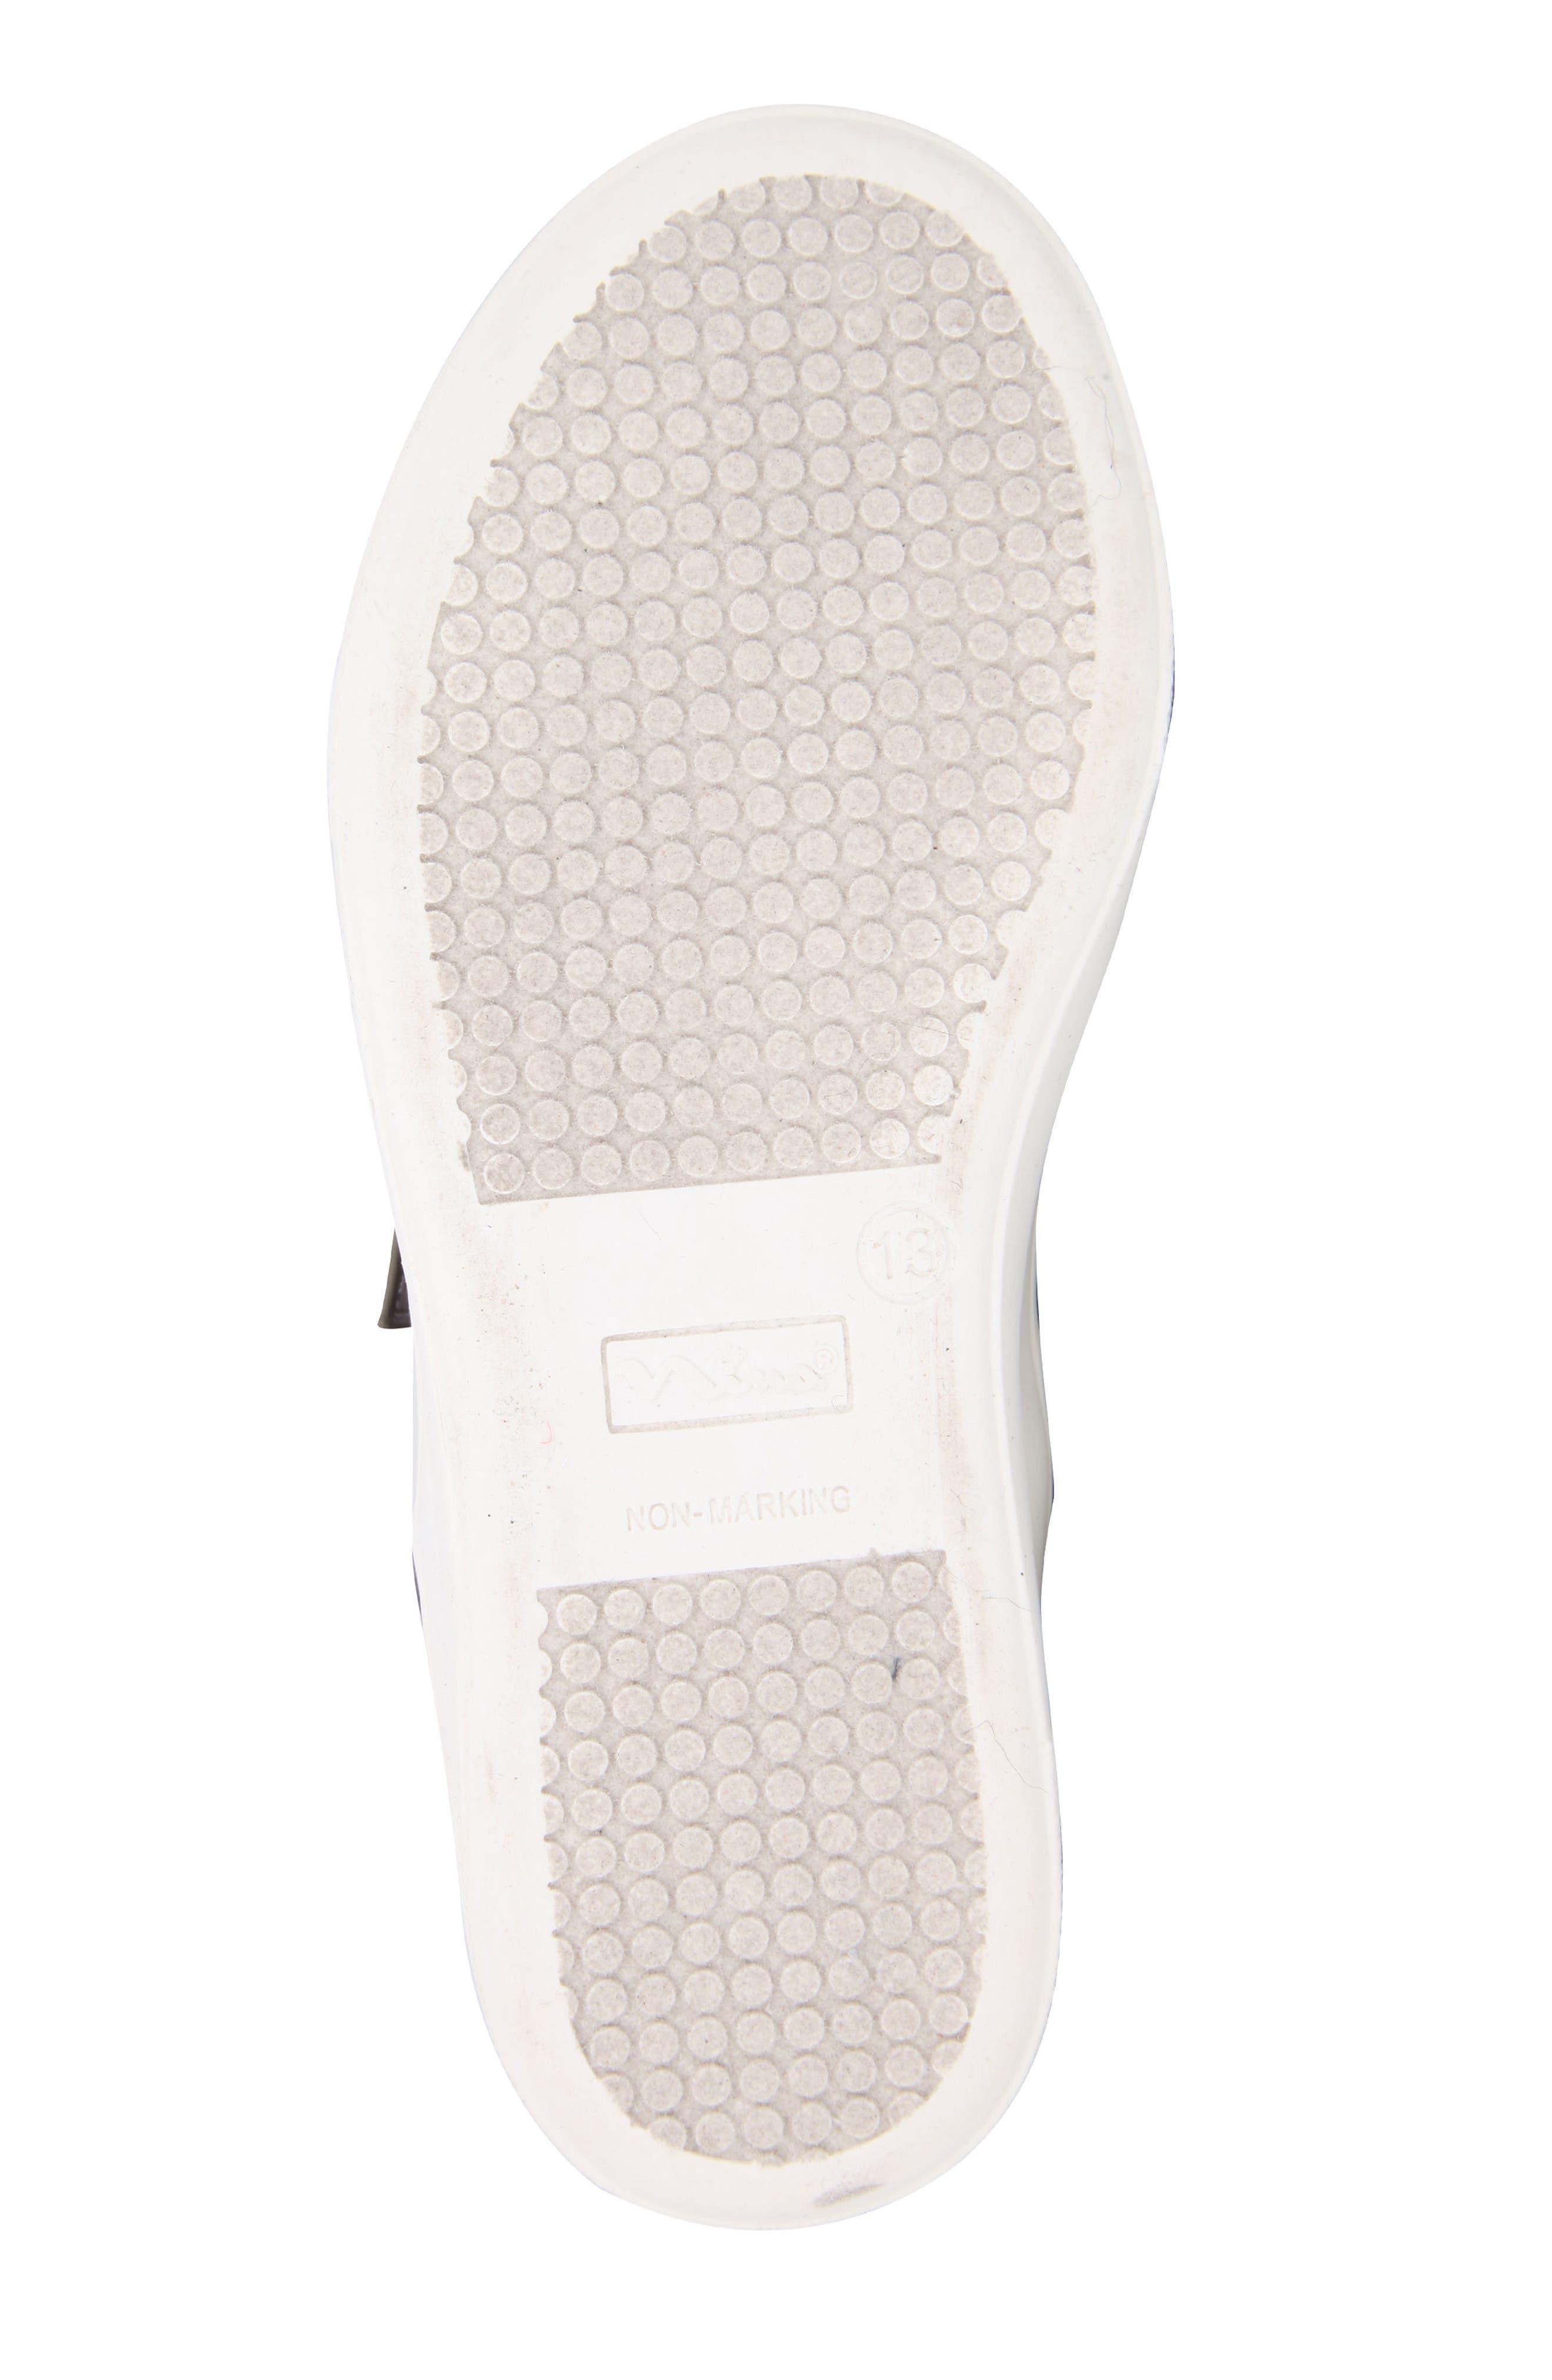 Pammela Glittery High Top Sneaker,                             Alternate thumbnail 5, color,                             Metallic Pewter